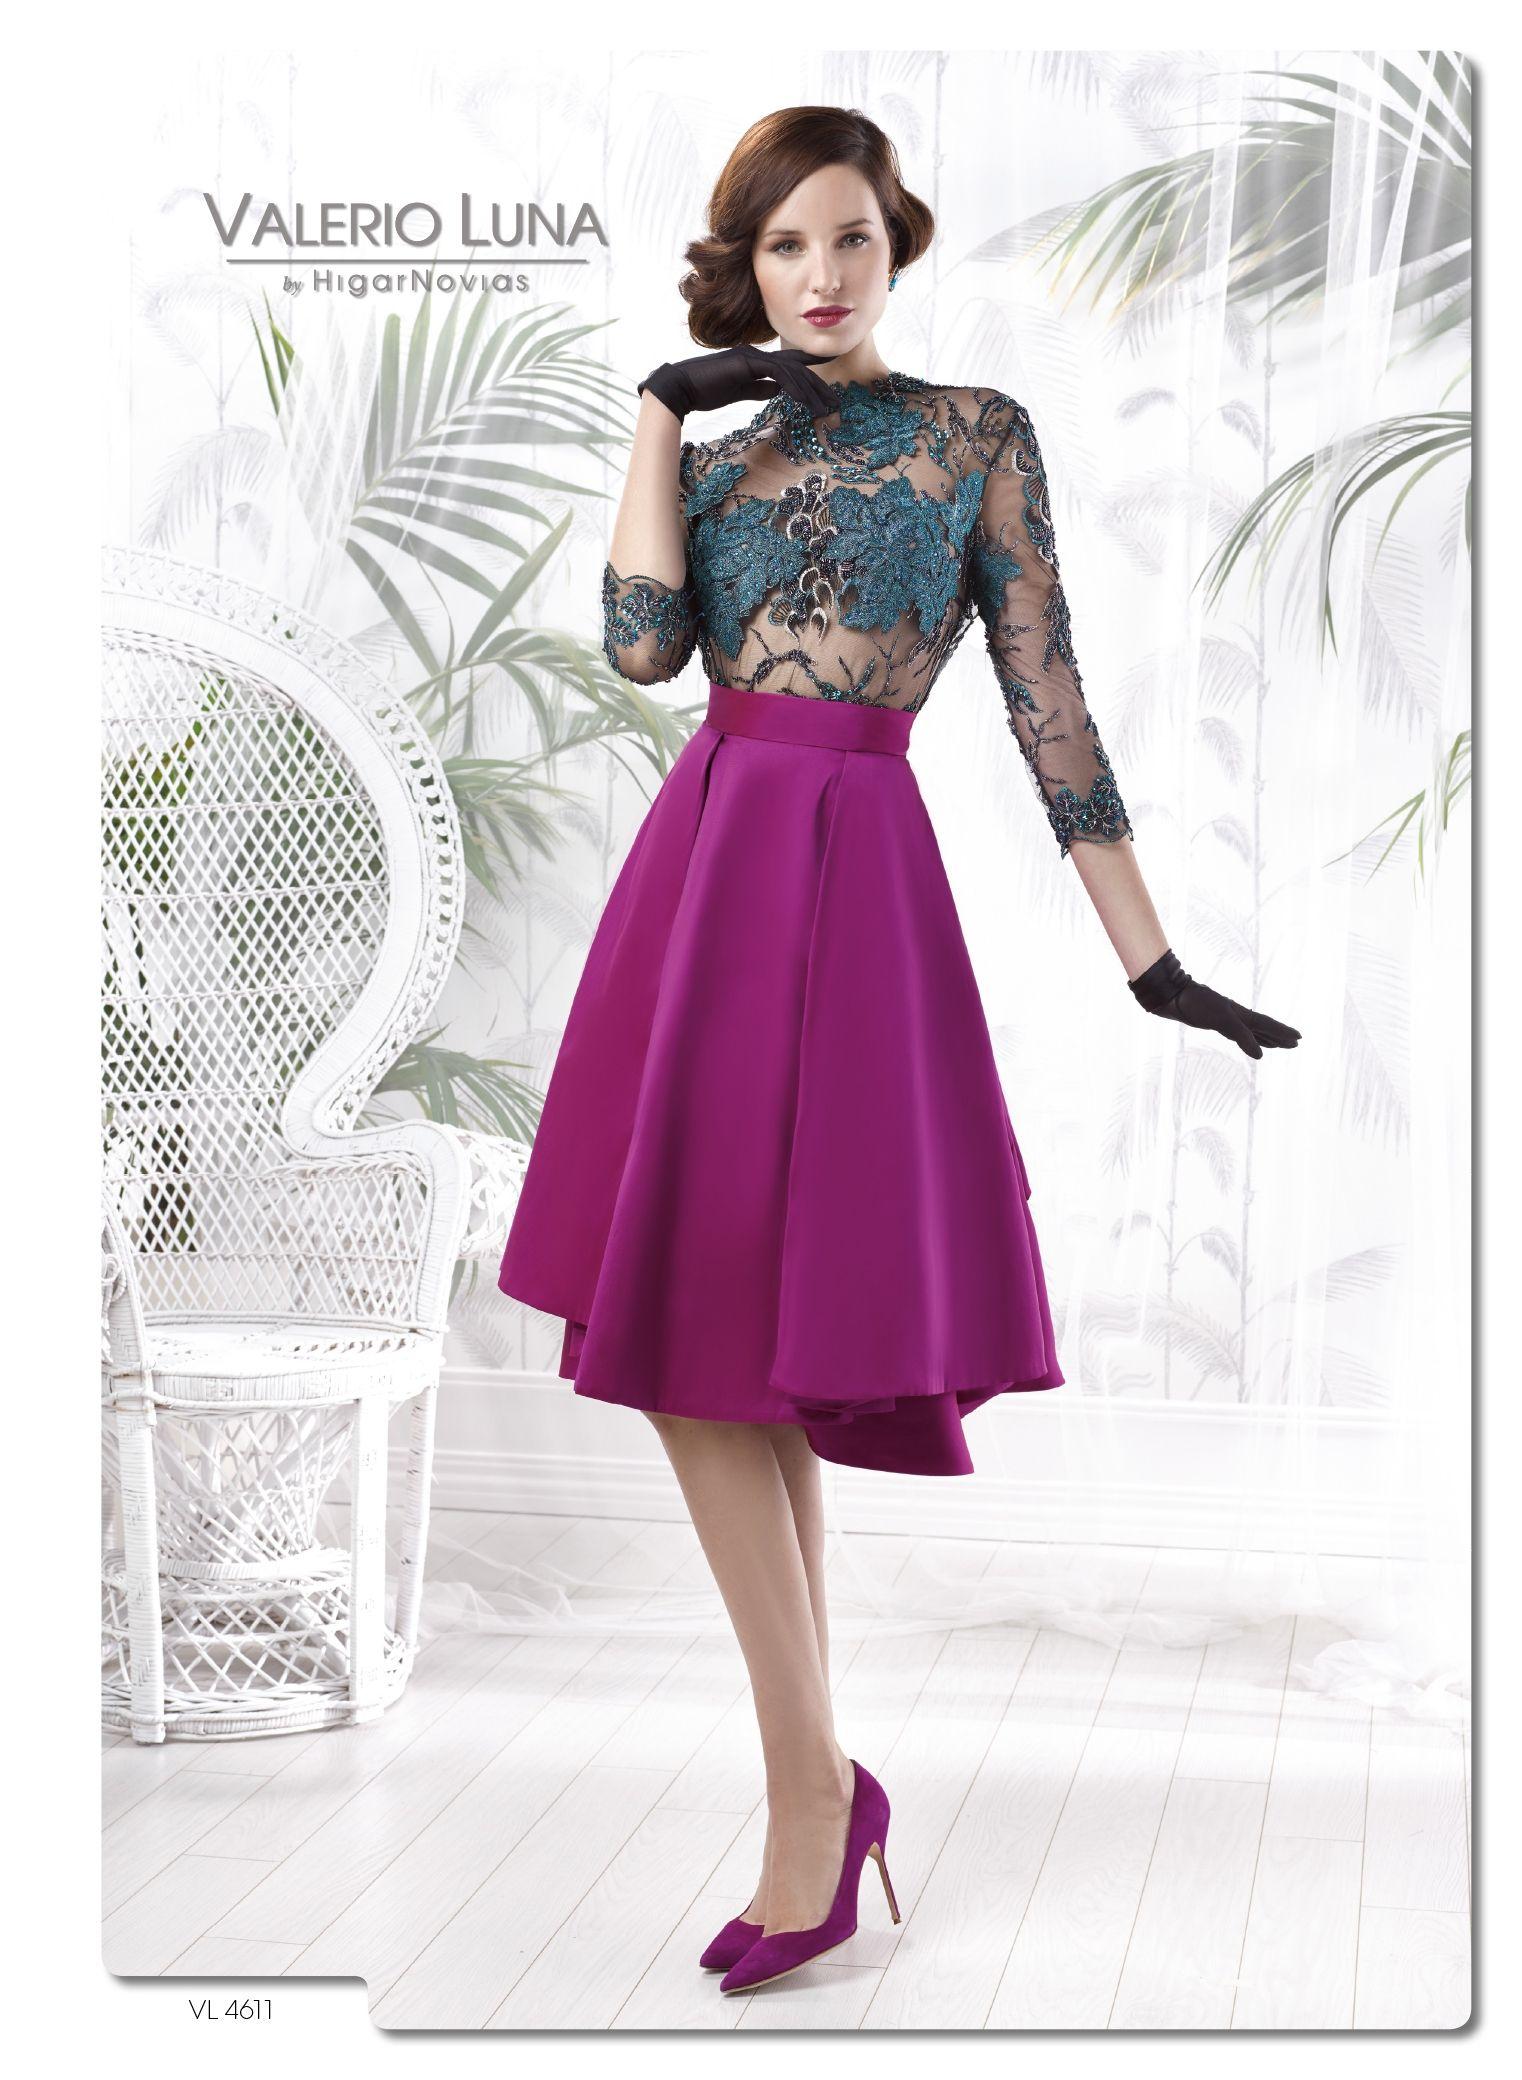 Valerio Luna | Fashion | Pinterest | Vestidos de encaje, De encaje y ...